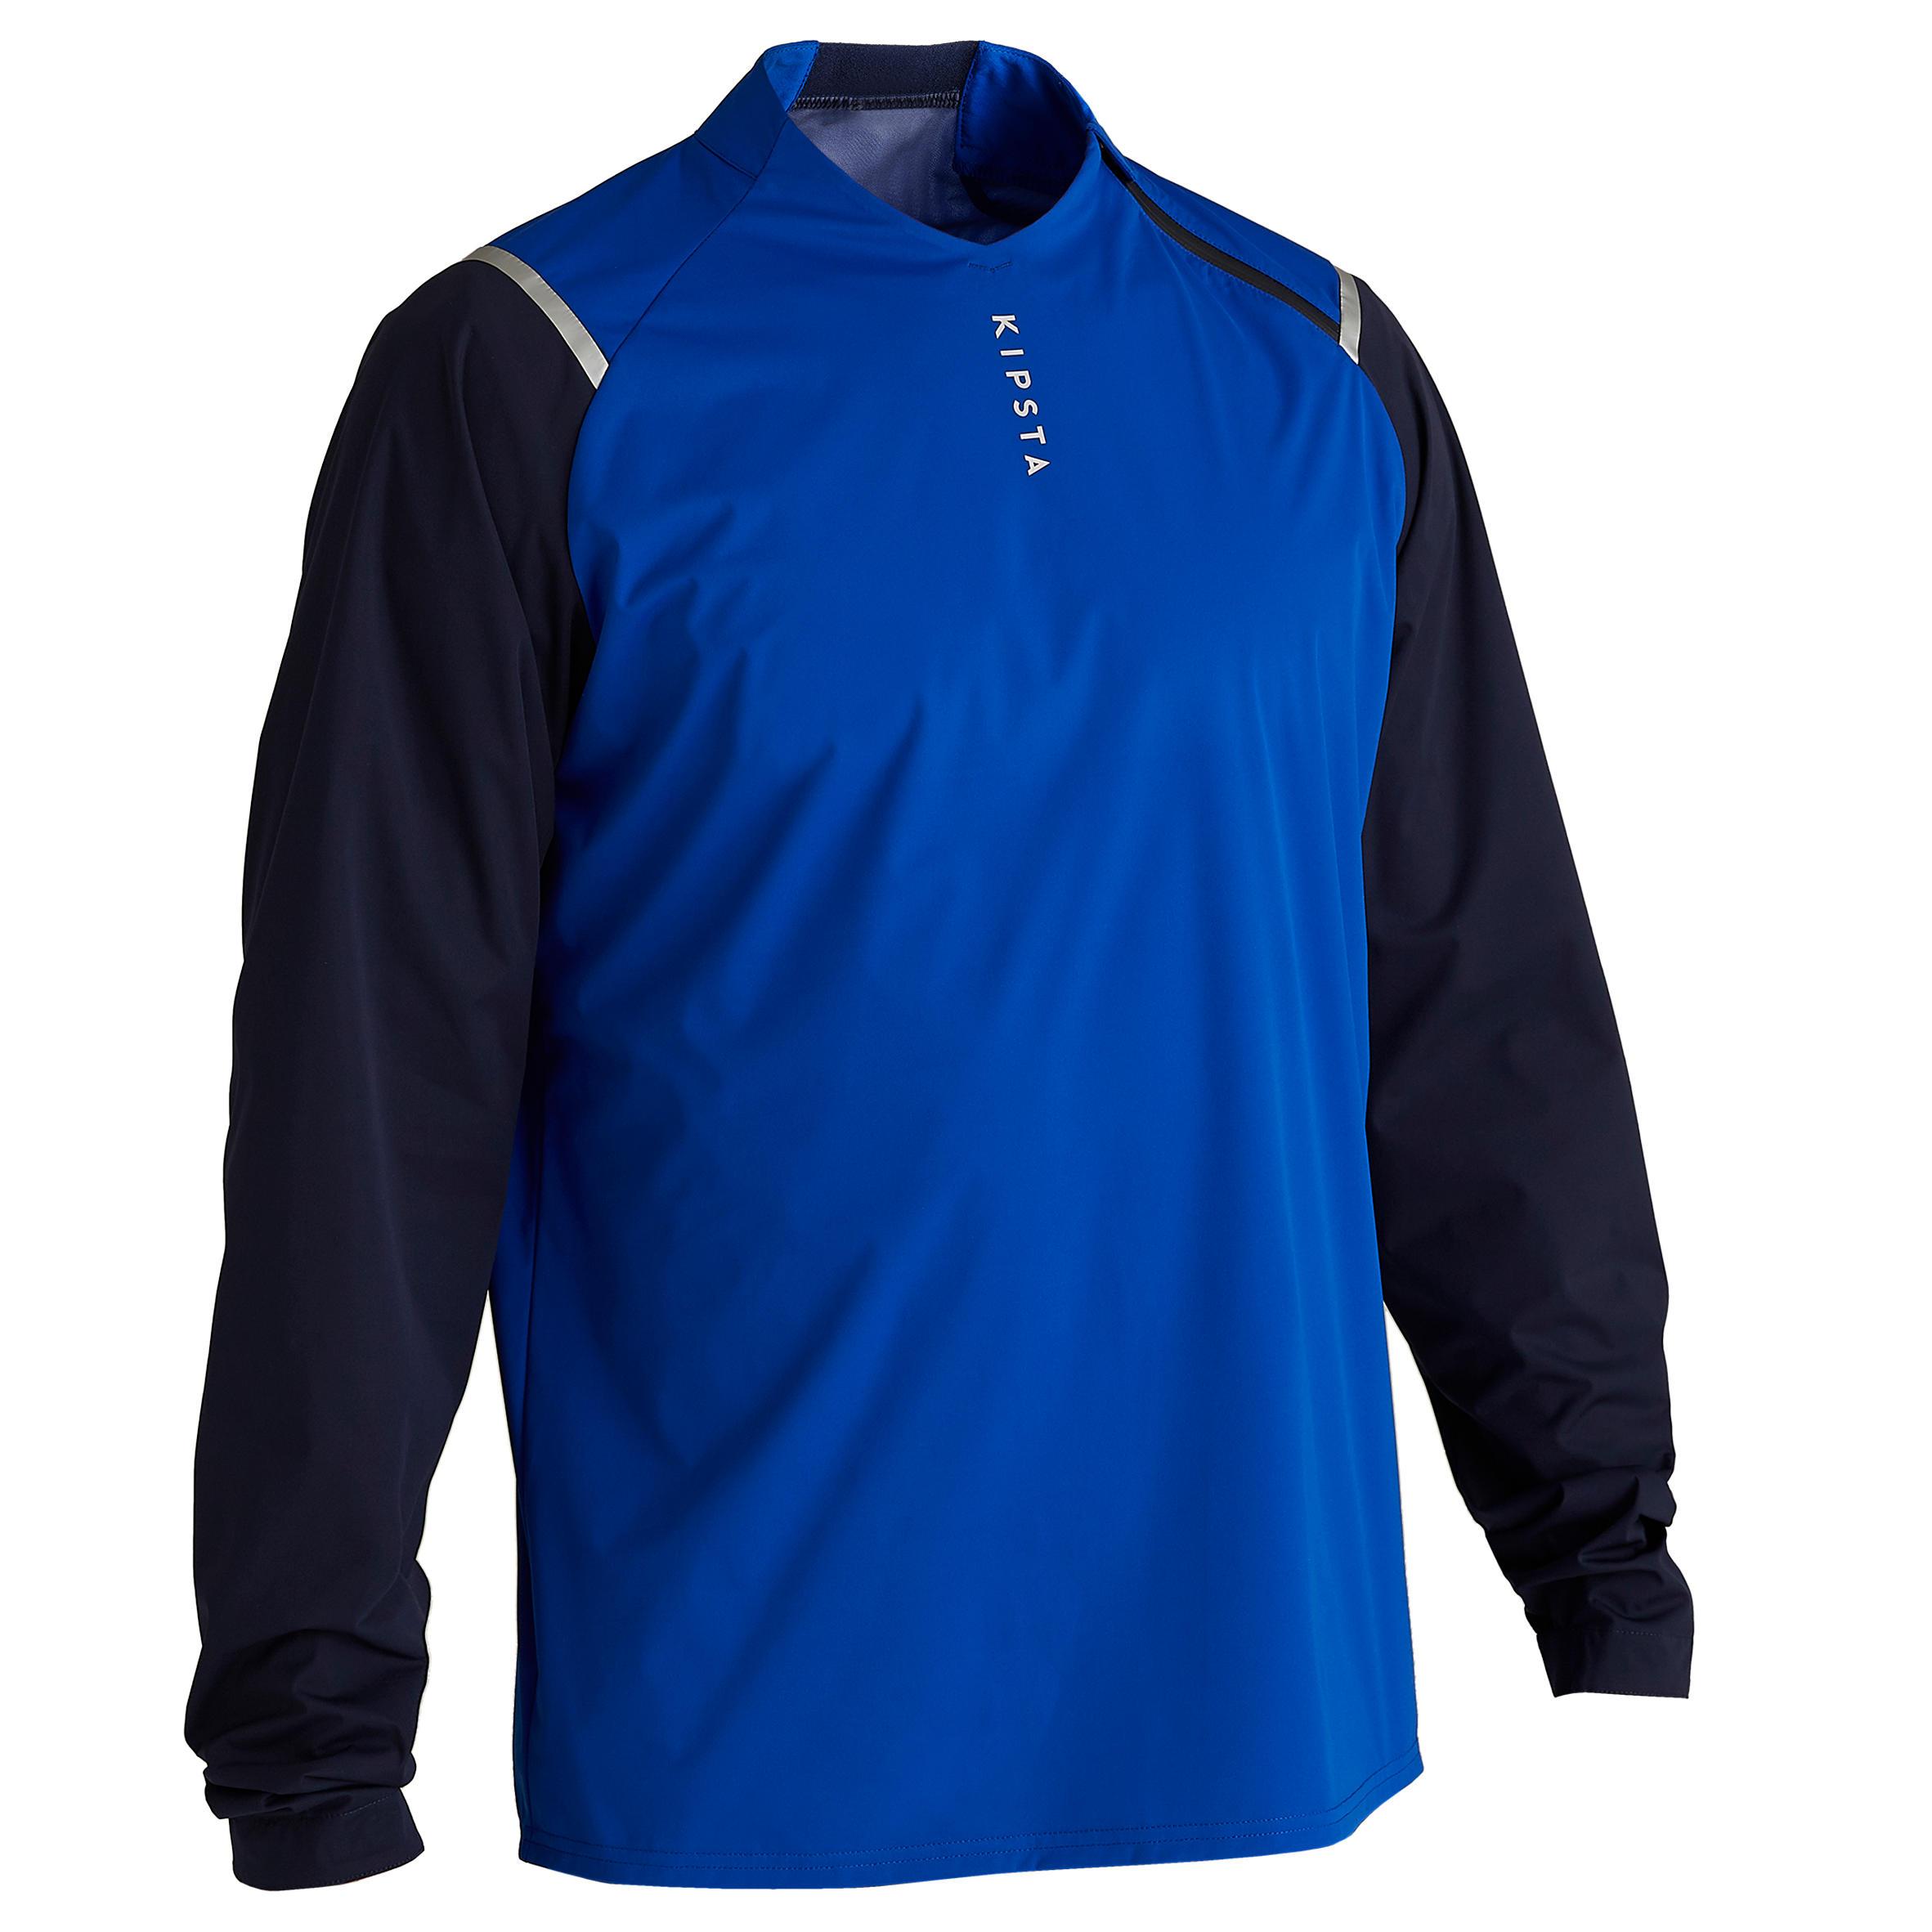 Regenjacke Training T500 Erwachsene blau | Sportbekleidung > Sportjacken > Regenjacken | Blau | Kipsta